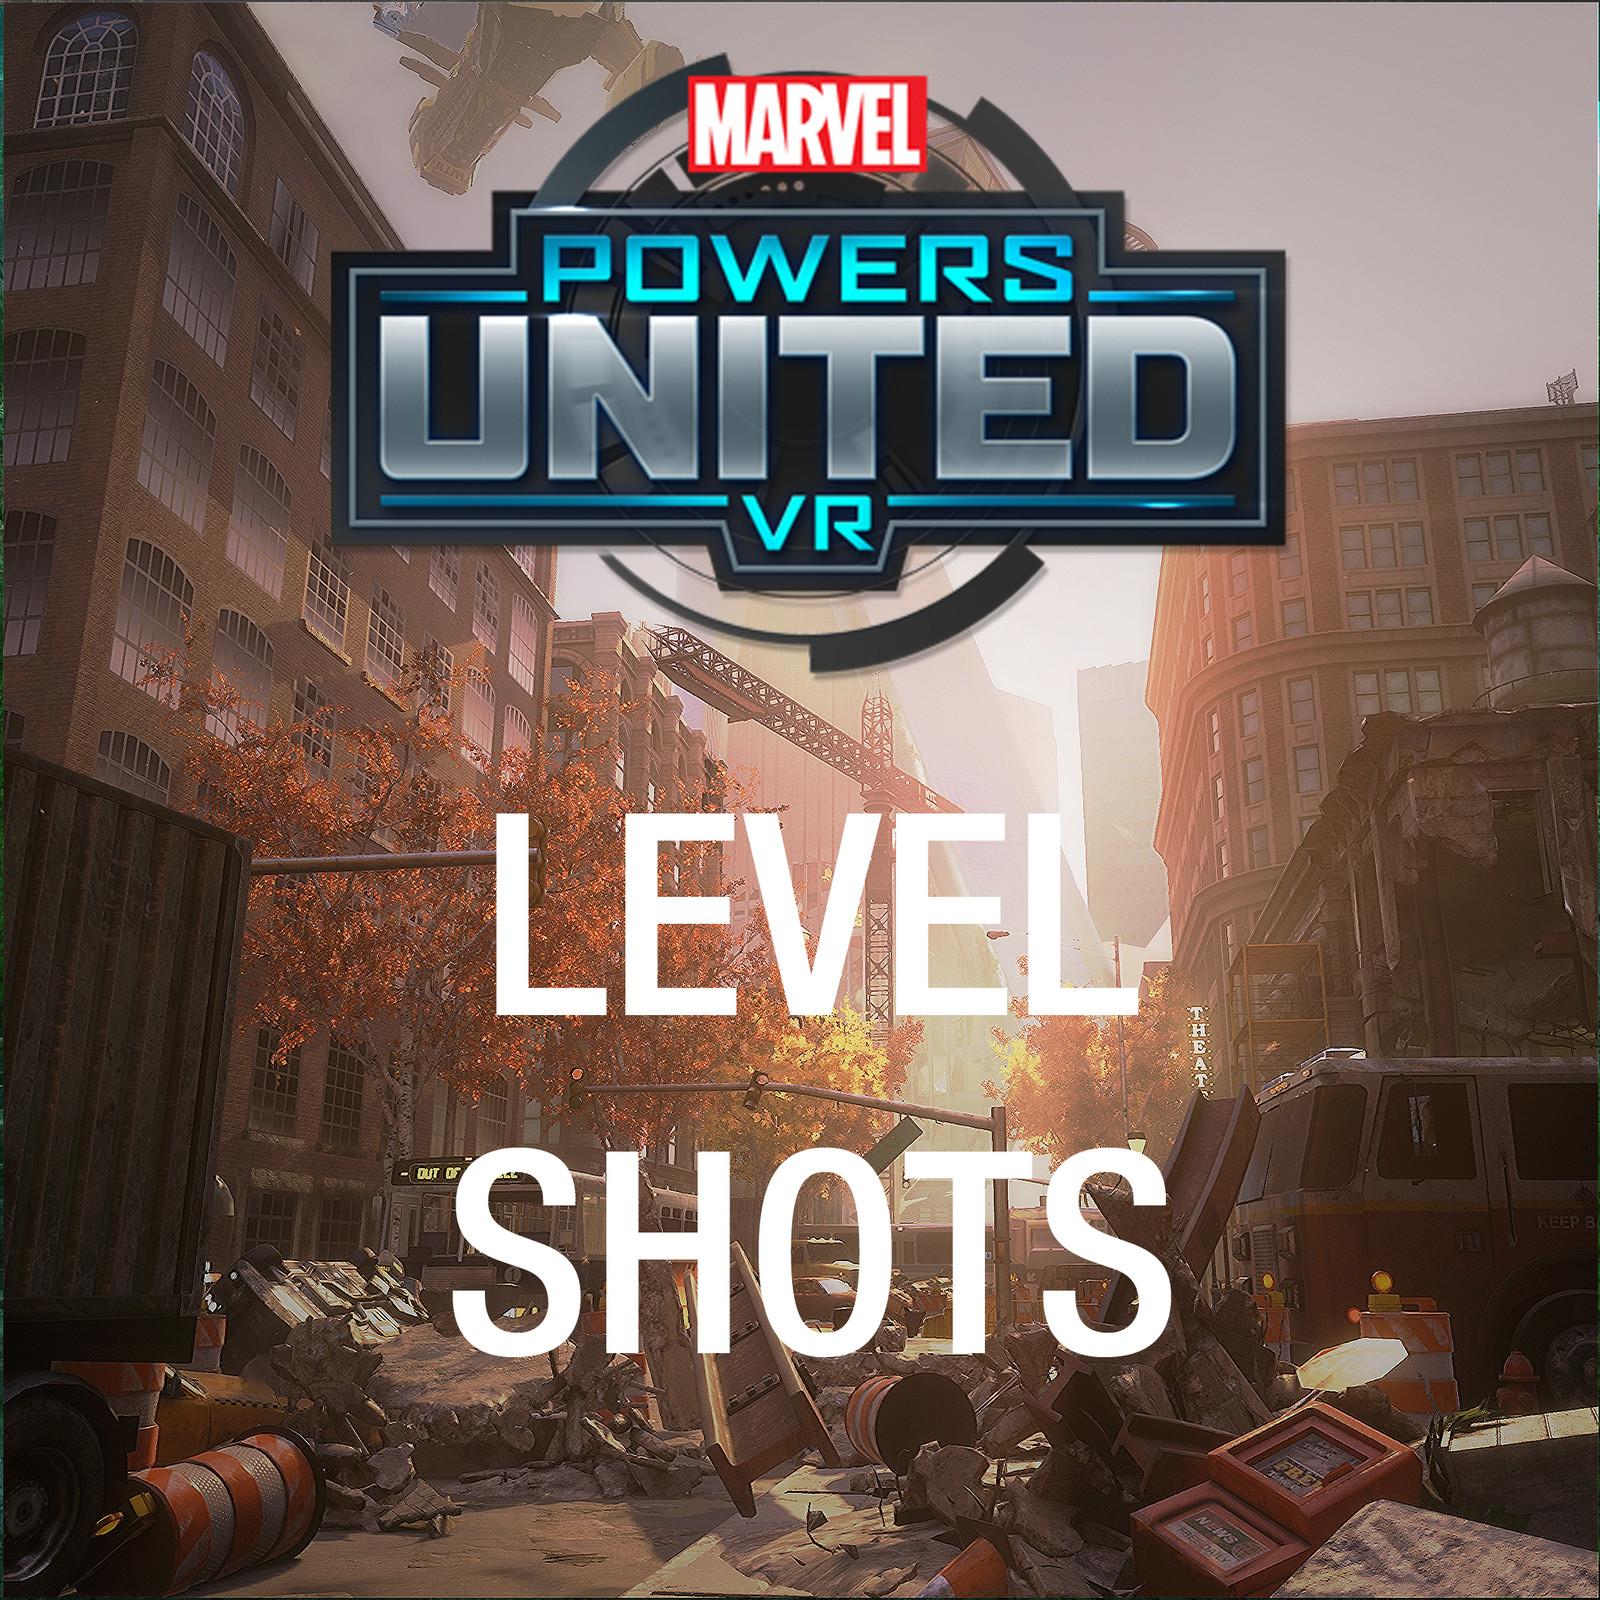 Marvel: Powers United VR - Level Shots